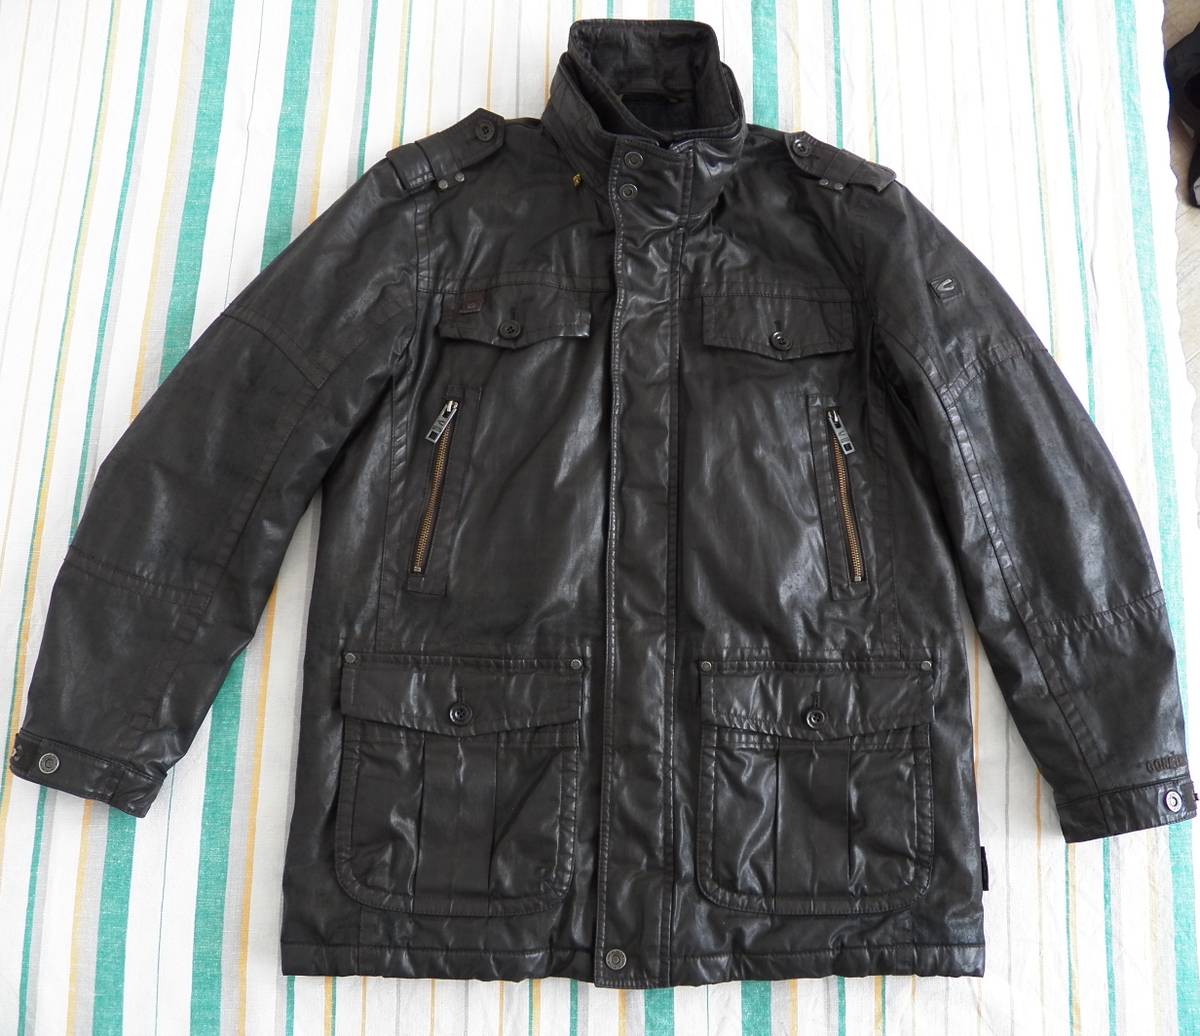 Camel Active × Goretex Camel Active Utility Gtx Jacket Eu 52 UsUk 42 Dark Brown Coated Cotton Size L $153